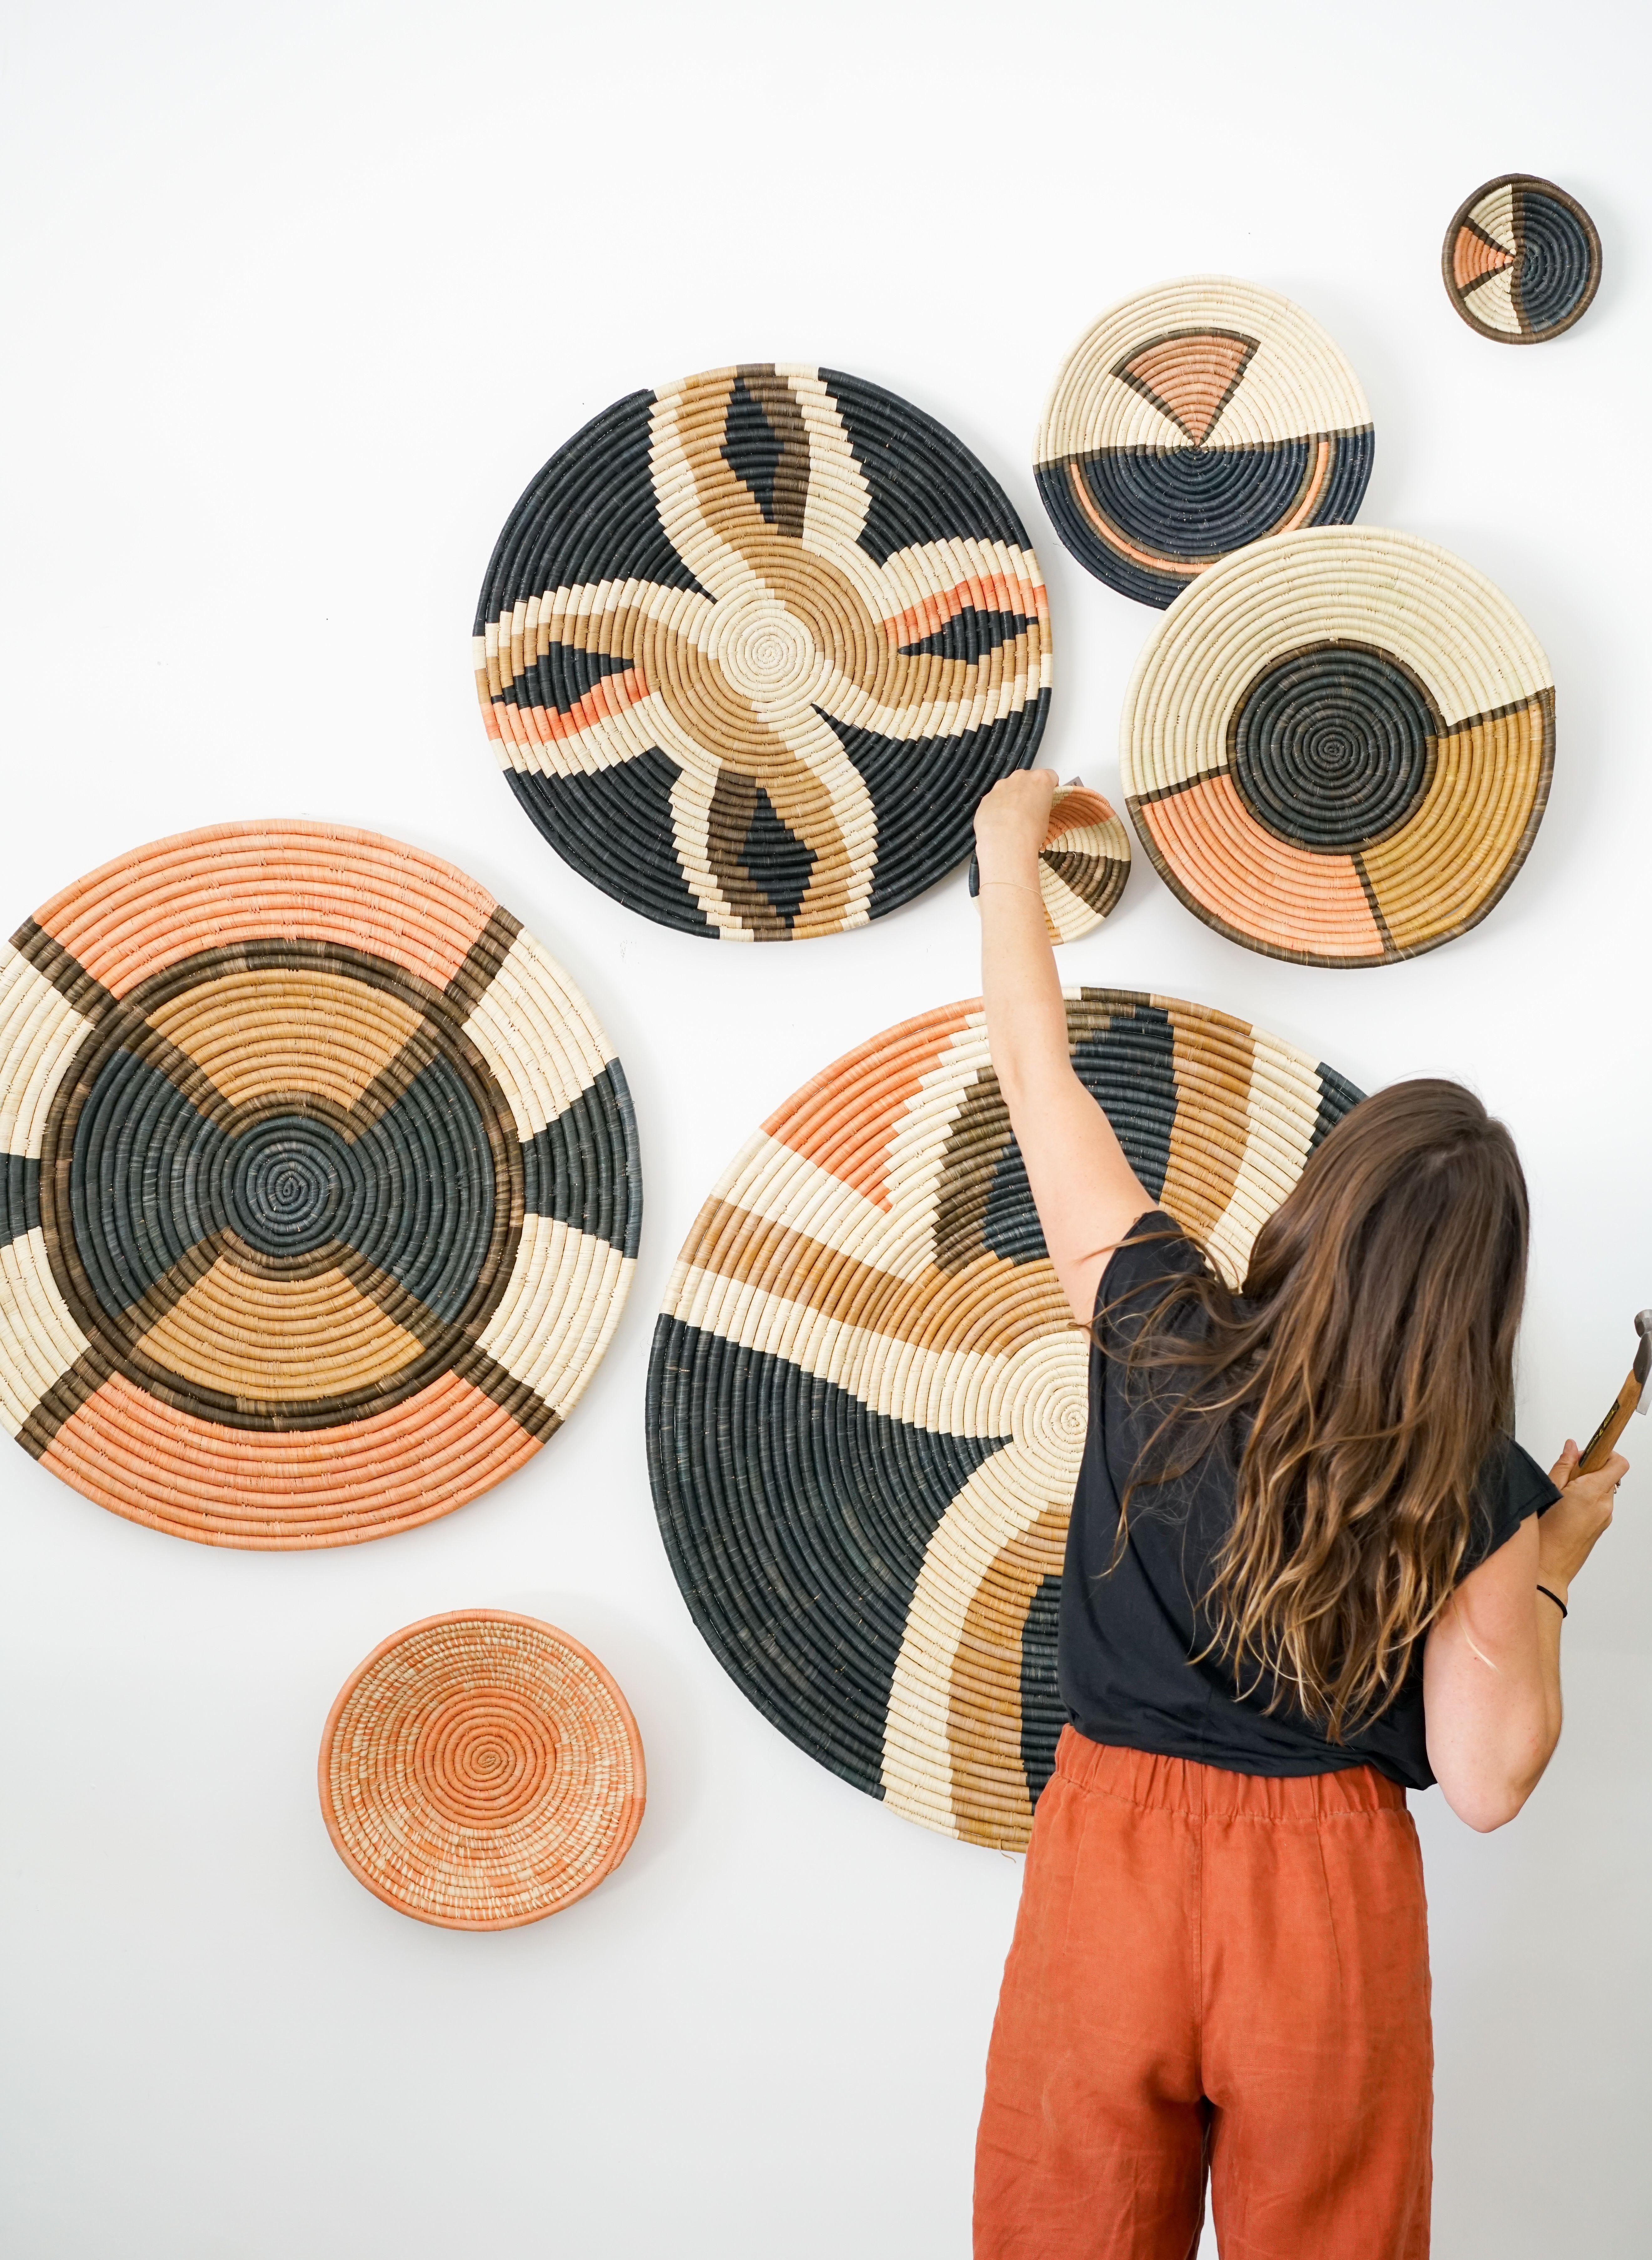 Handwoven Baskets - diy home - #Baskets #BeachHouse #diy #Diyfurniture #diyhome #Diyhomeimprotvemen #Diywoodprojects #FrenchCountry #Handwoven #HollywoodRegency #home #Industrial #Livingroomwalldecorideas #MidCentury #Modern #Rustichomedecor #Traditional